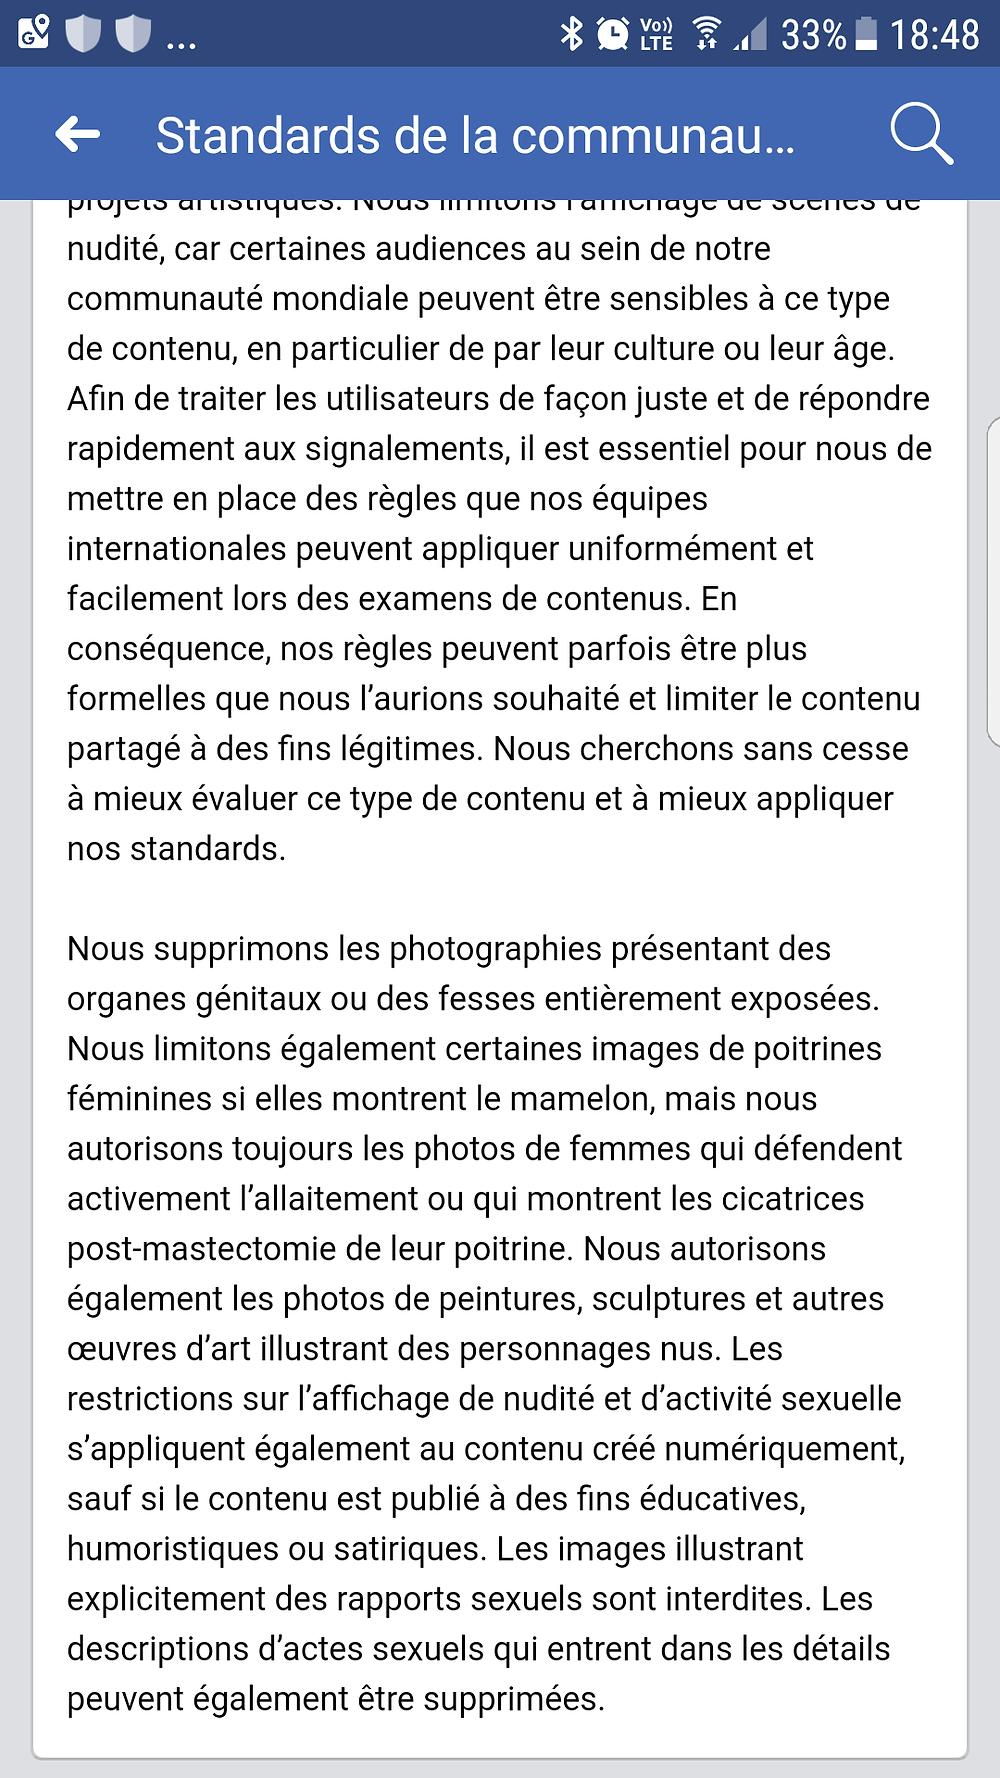 Charte FACEBOOK autorisant la publication de peintures de nu